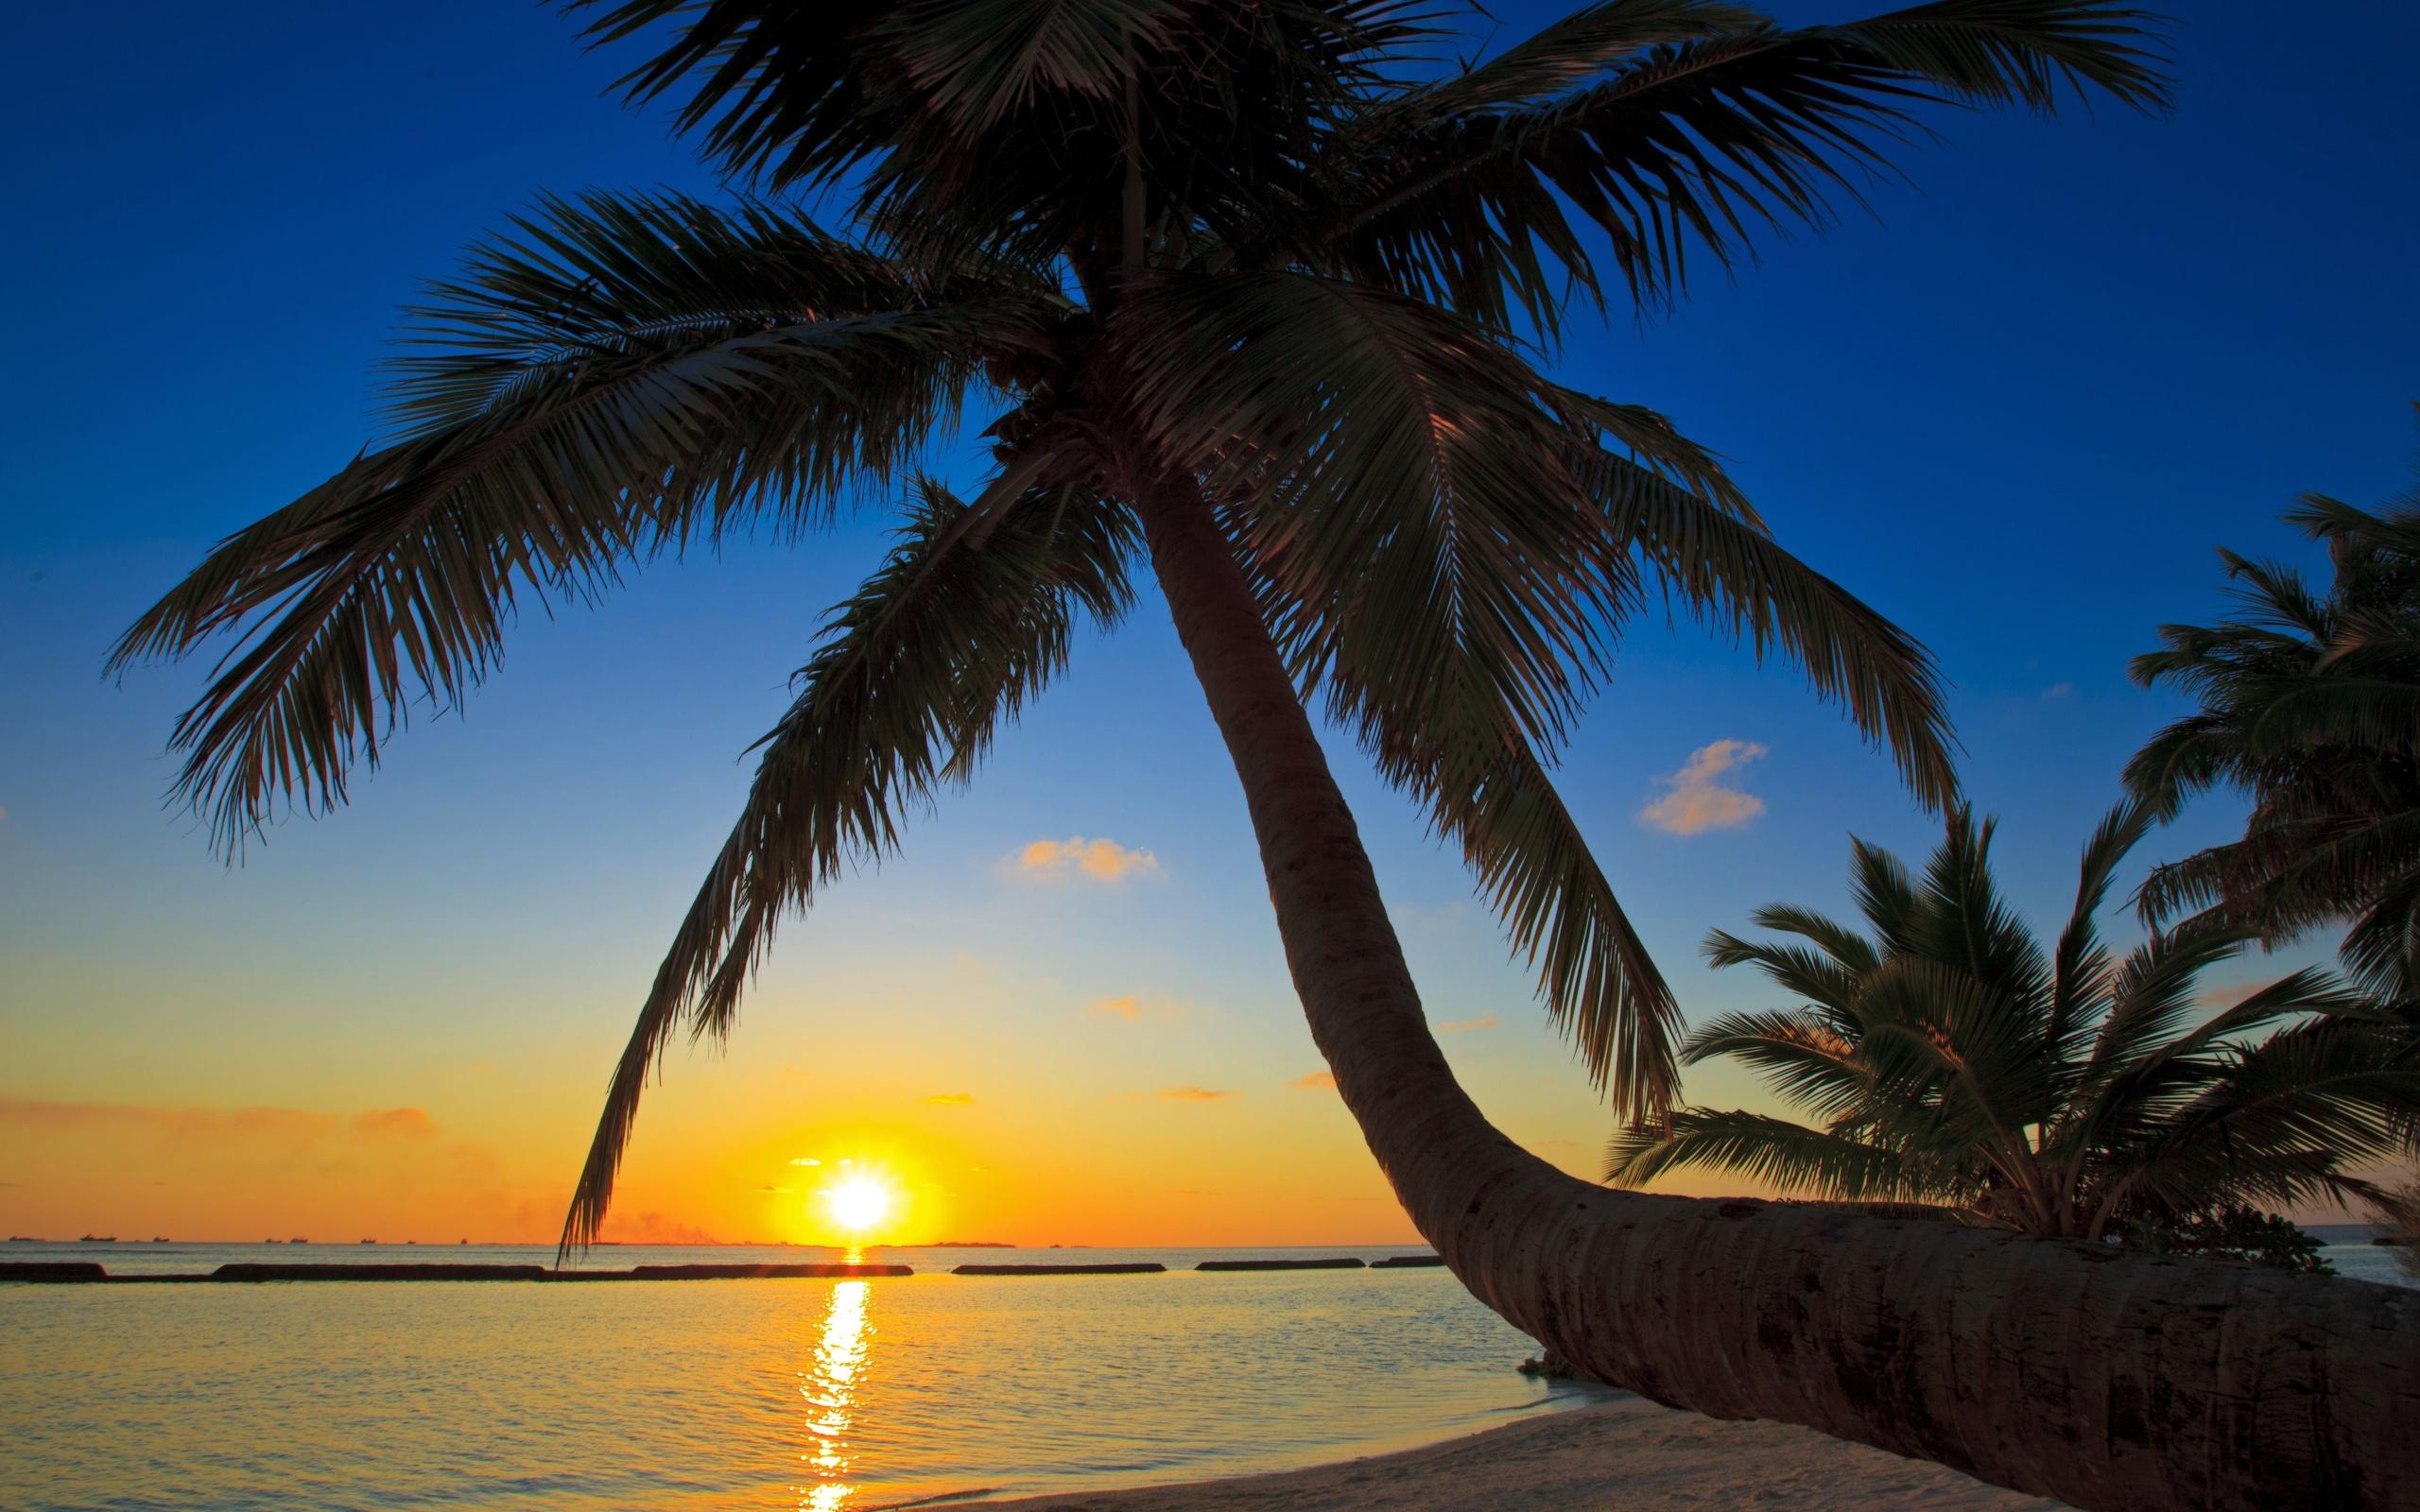 palm tree beach sunset wallpaper - photo #18